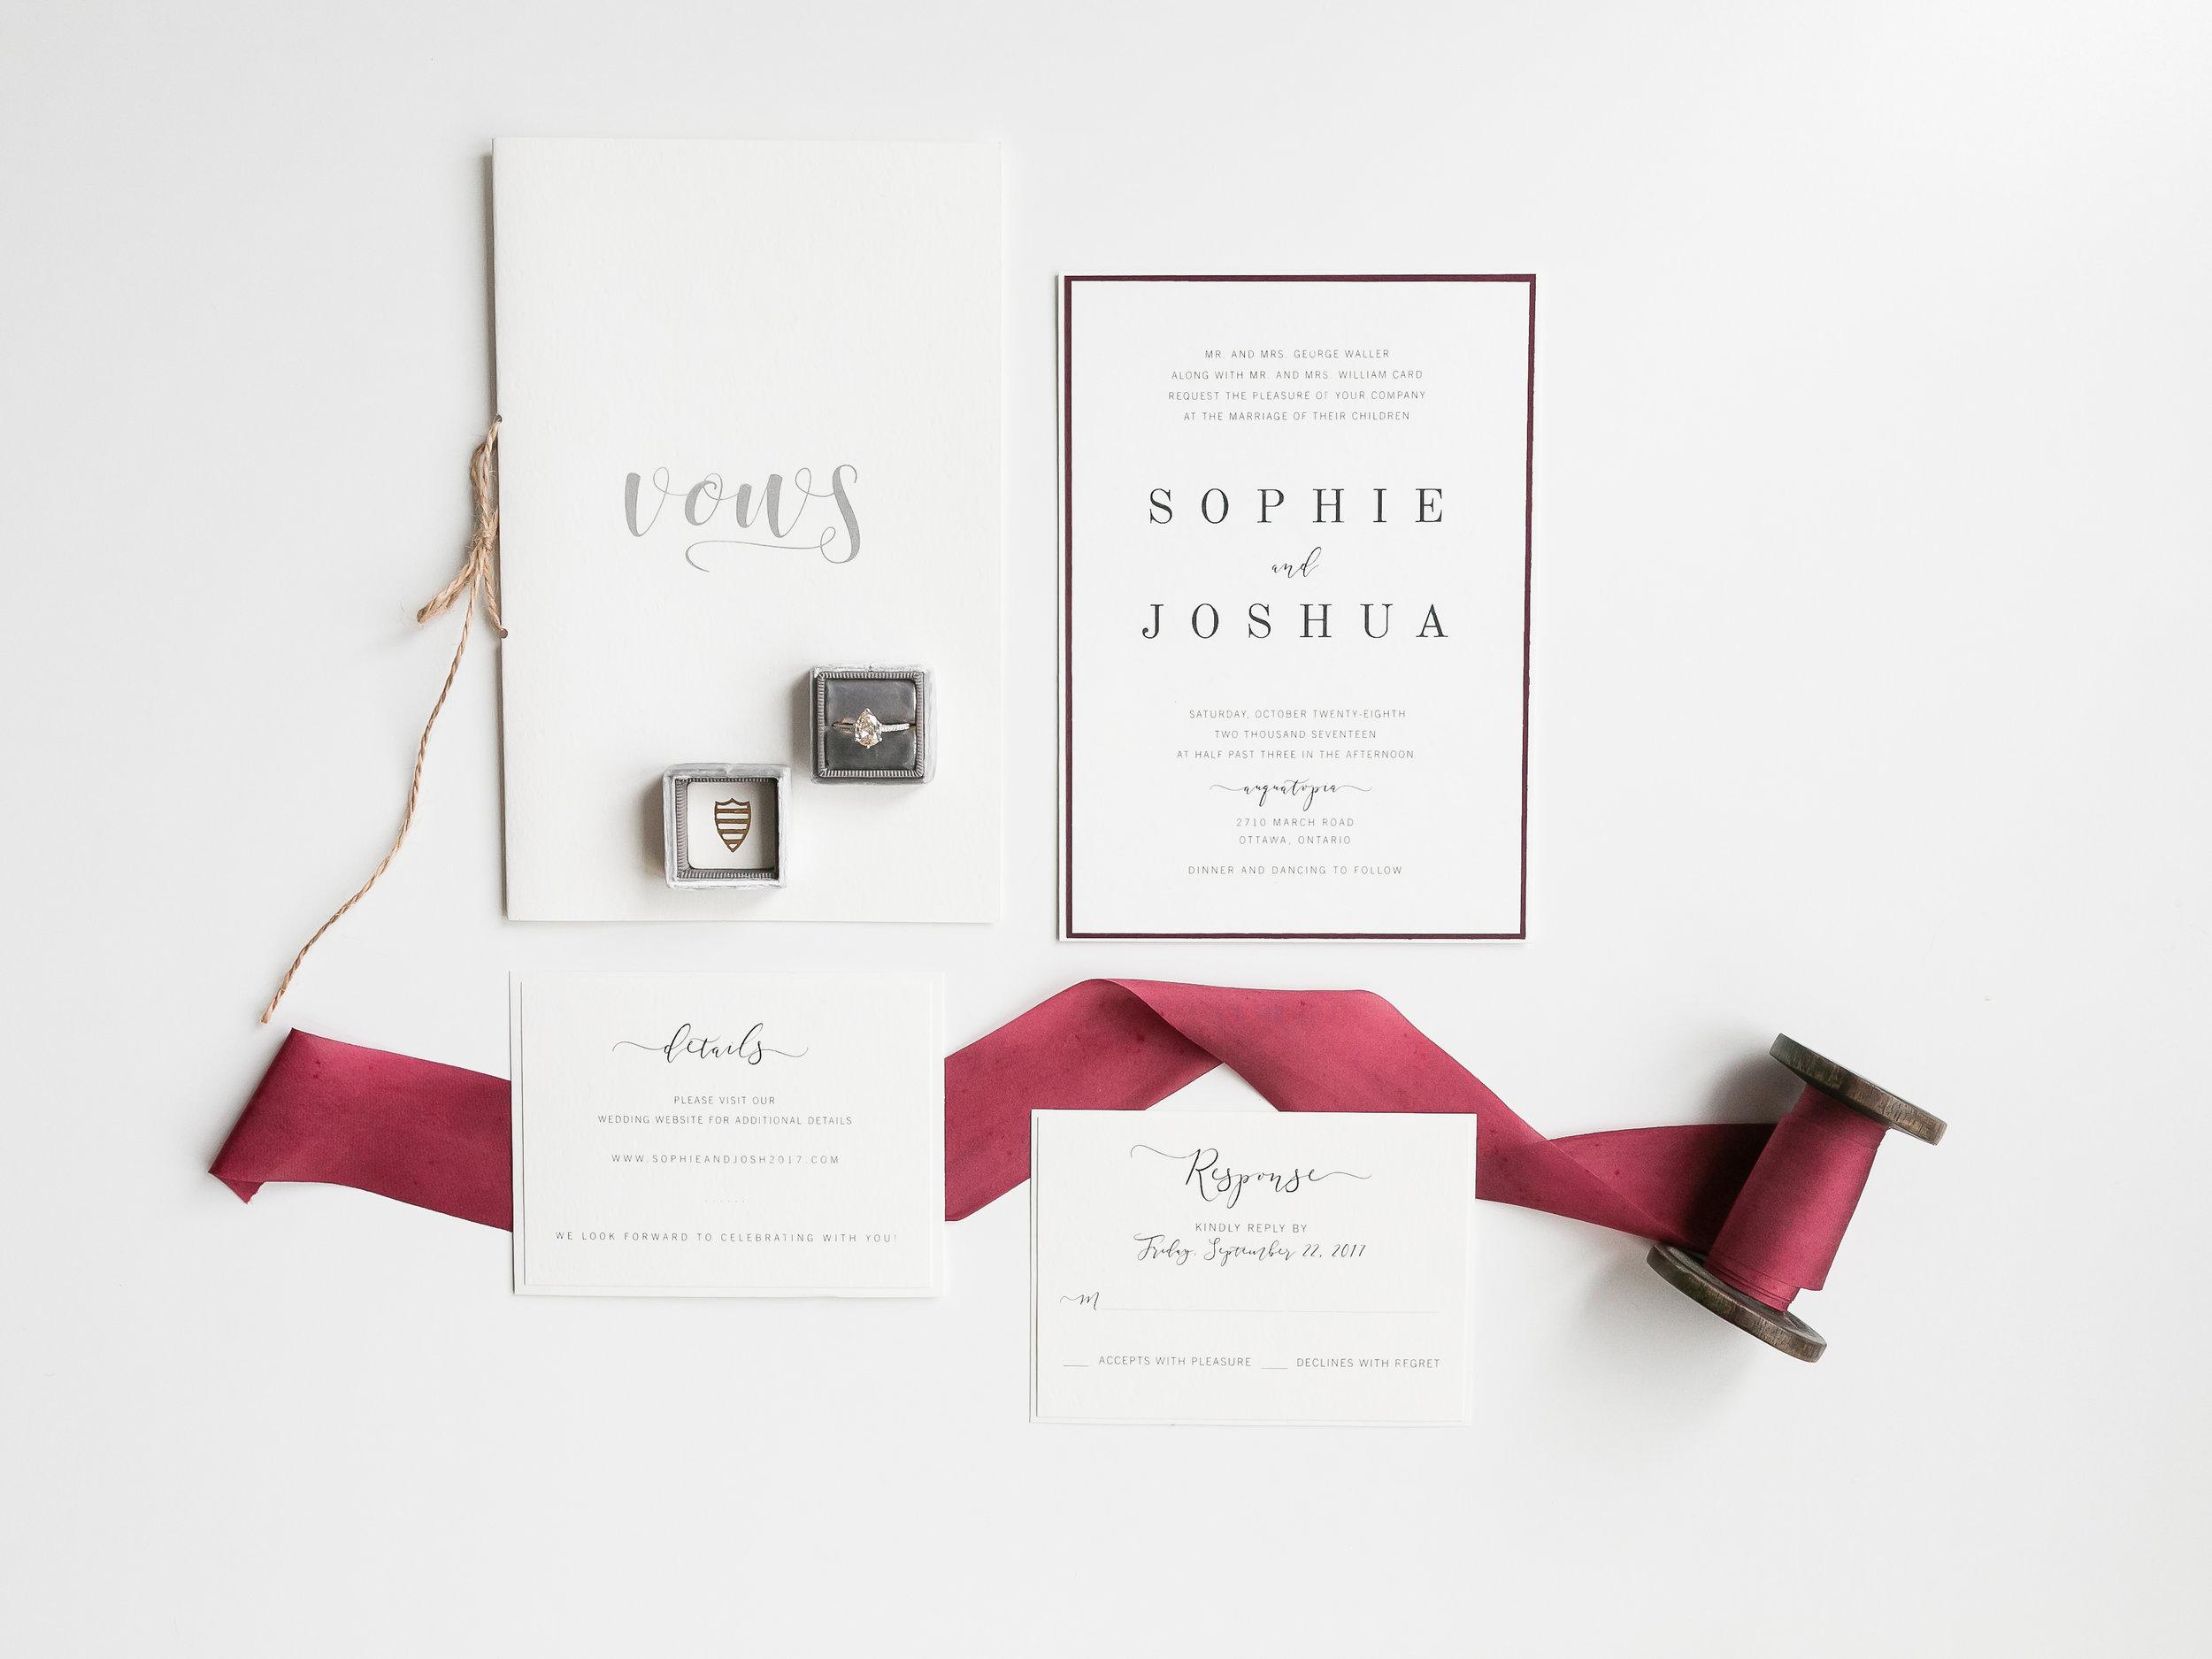 Aquatopia-Wedding-Ottawa-Wedding-Photographer-Stephanie-Mason-Photography-6.jpg